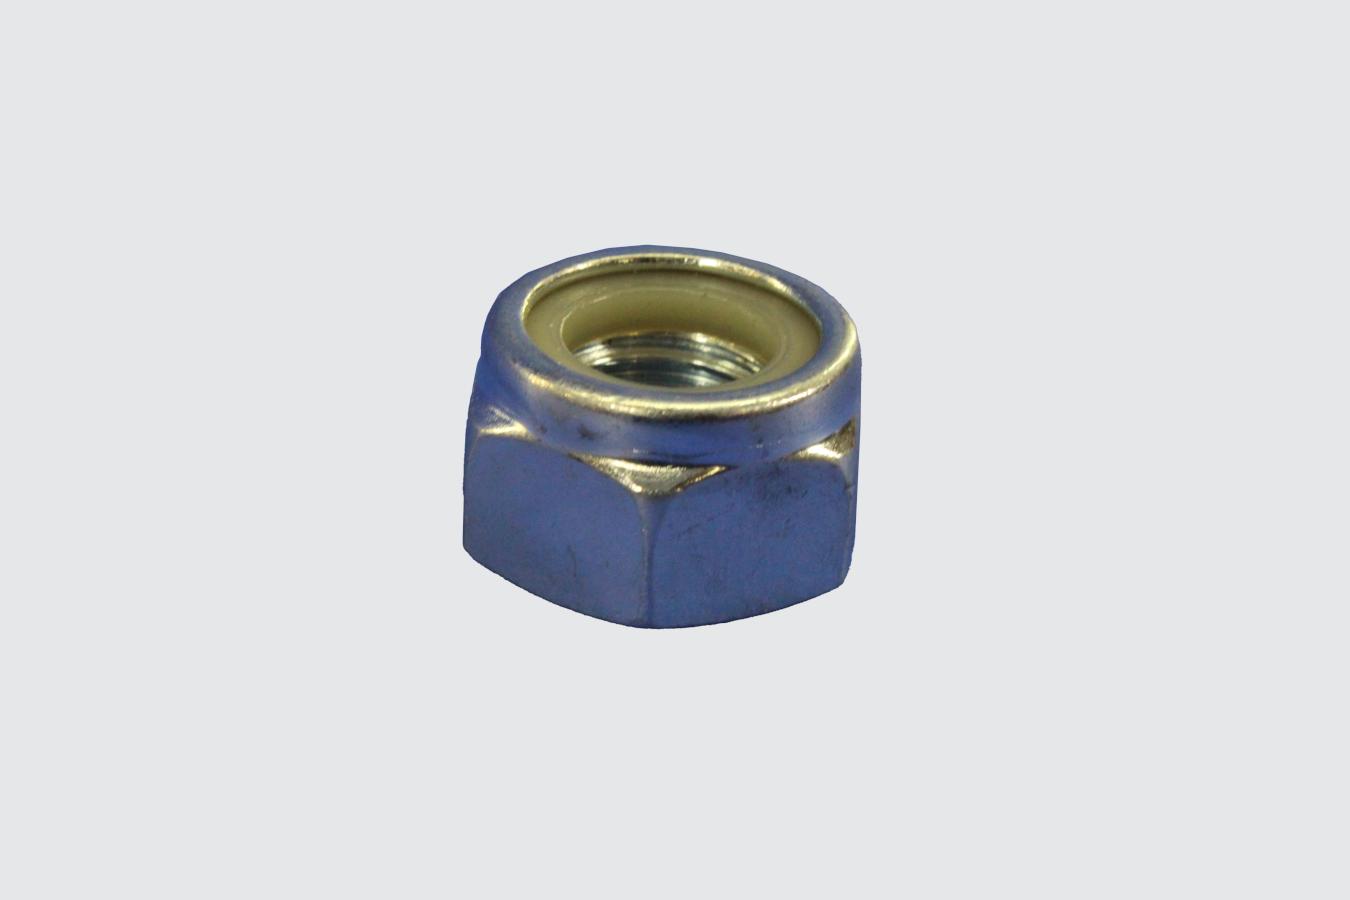 35304047-NUT, M12-1.75 NYLON INSERT LOCK ZINC